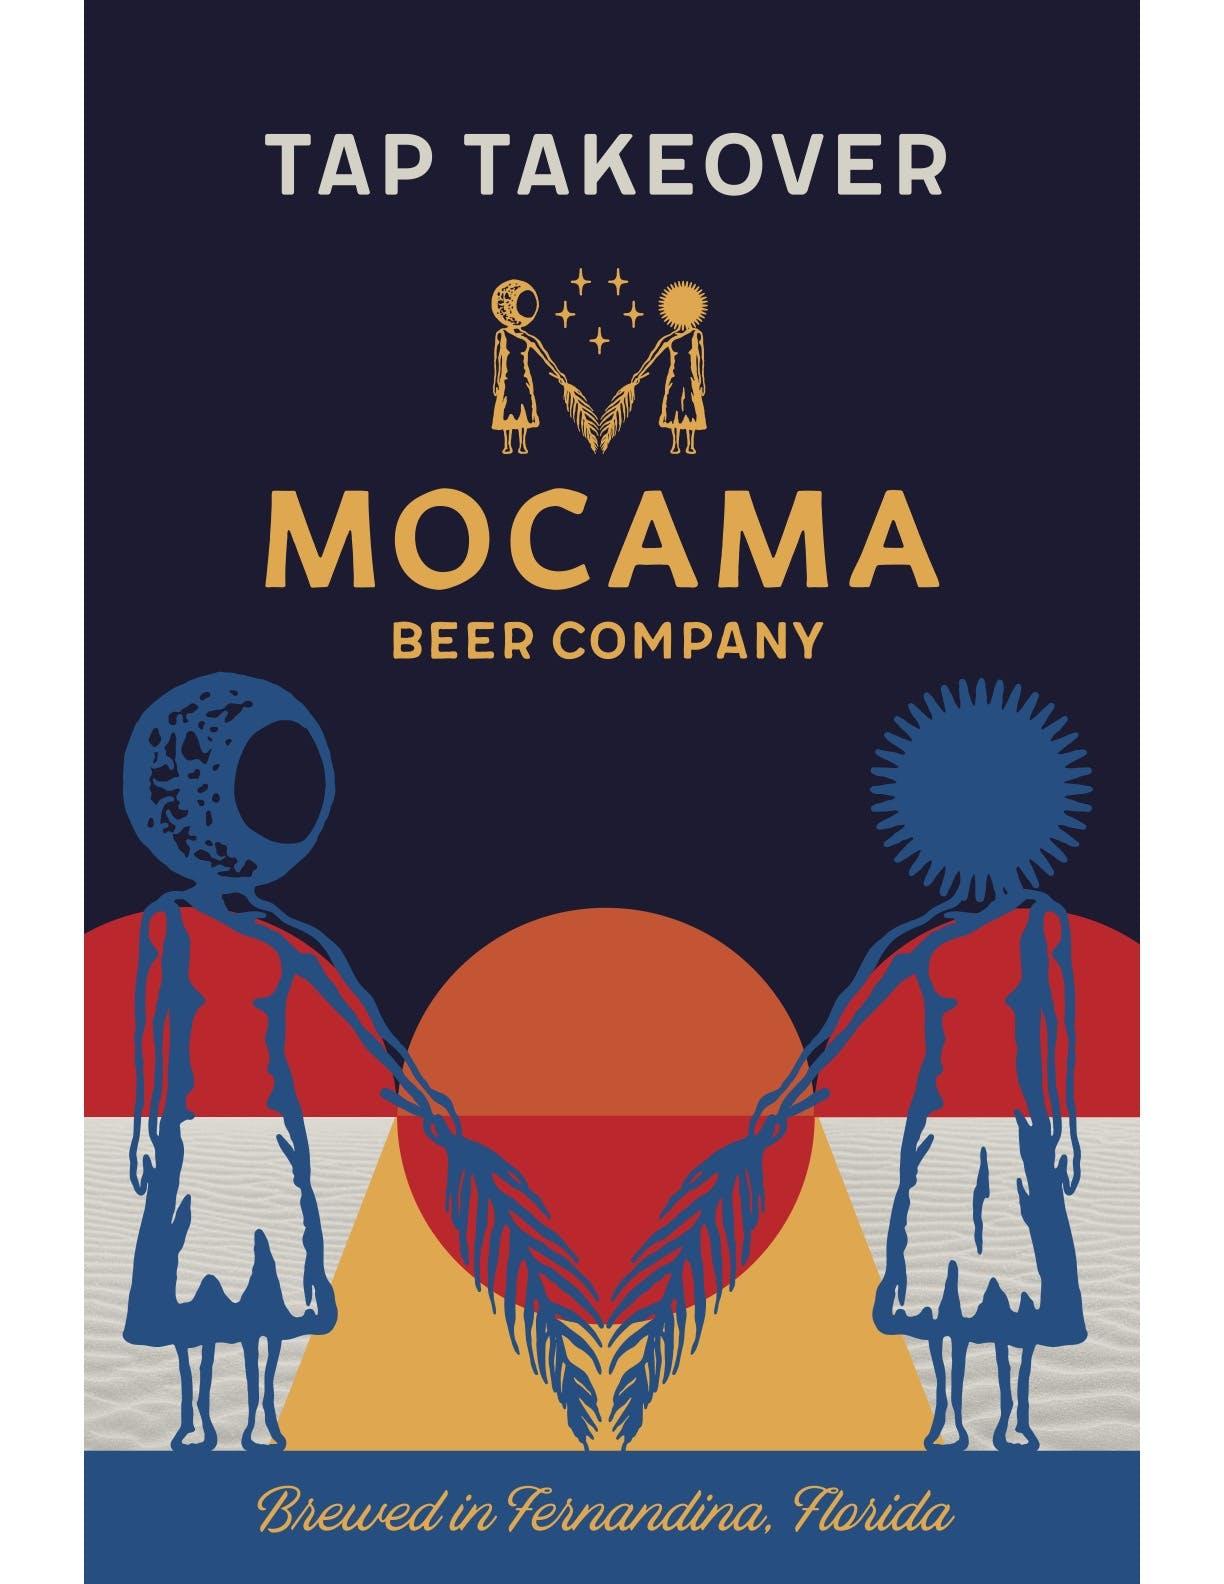 MOCAMA POSTERS 24X36-2